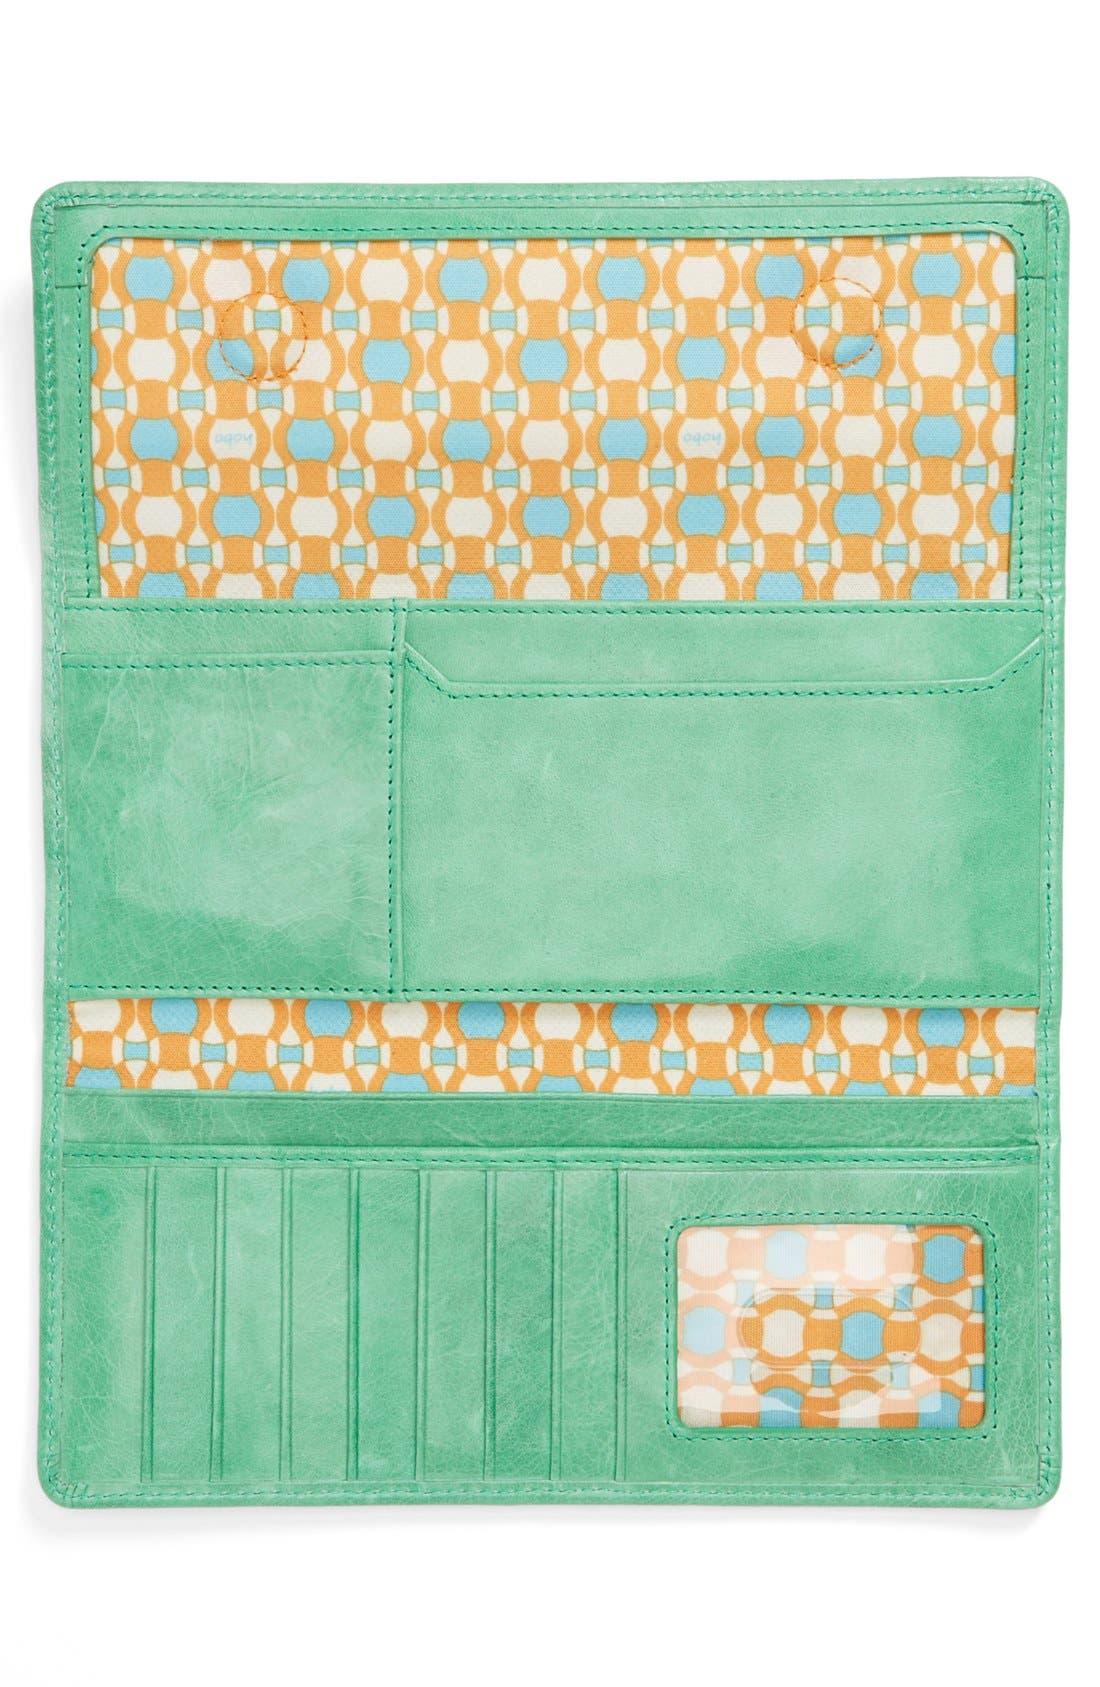 'Sadie' Leather Wallet,                             Alternate thumbnail 122, color,